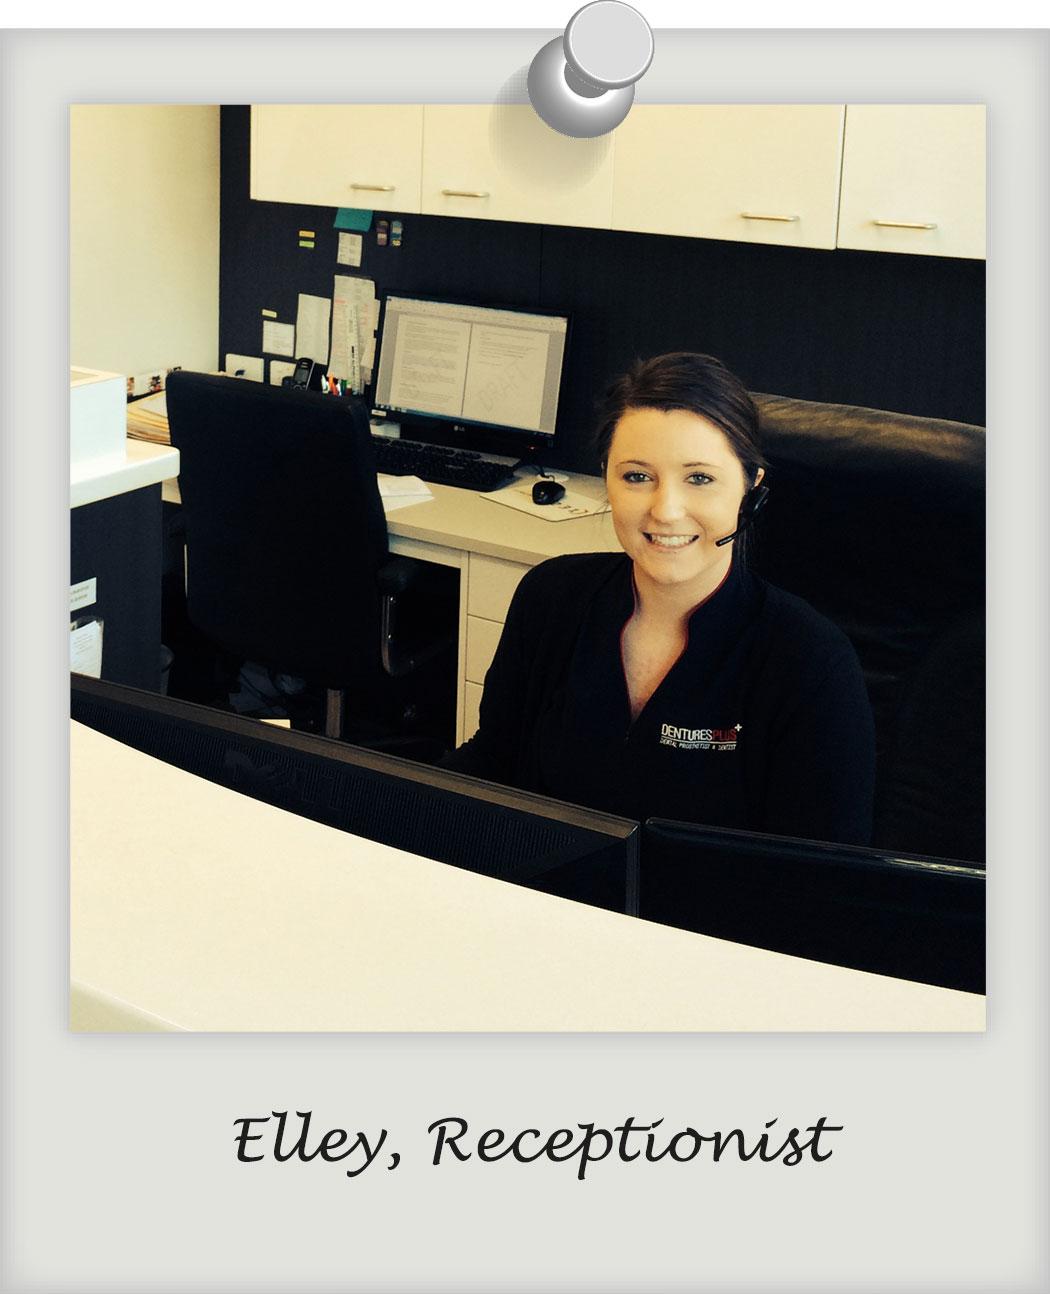 Elley-receptionist